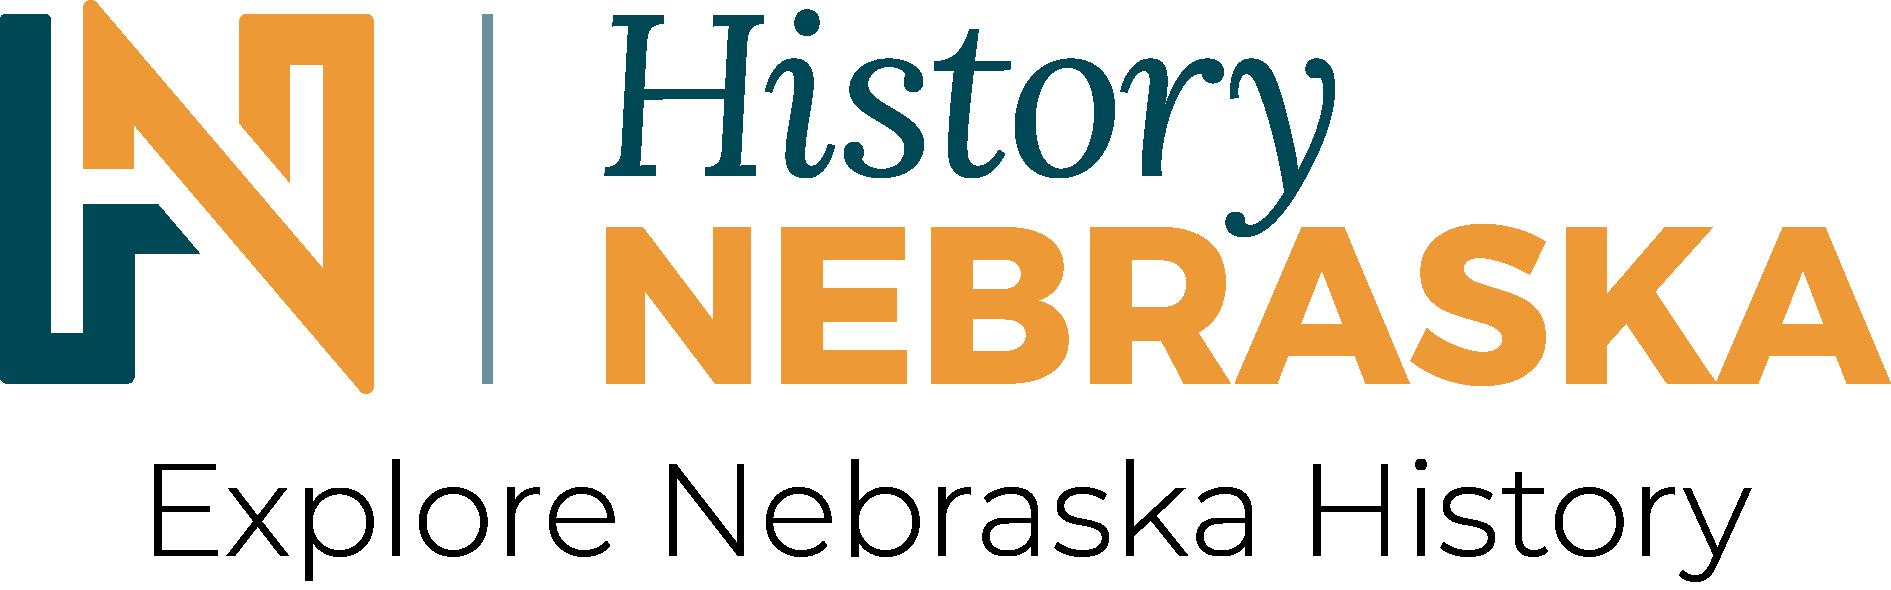 Explore Nebraska History